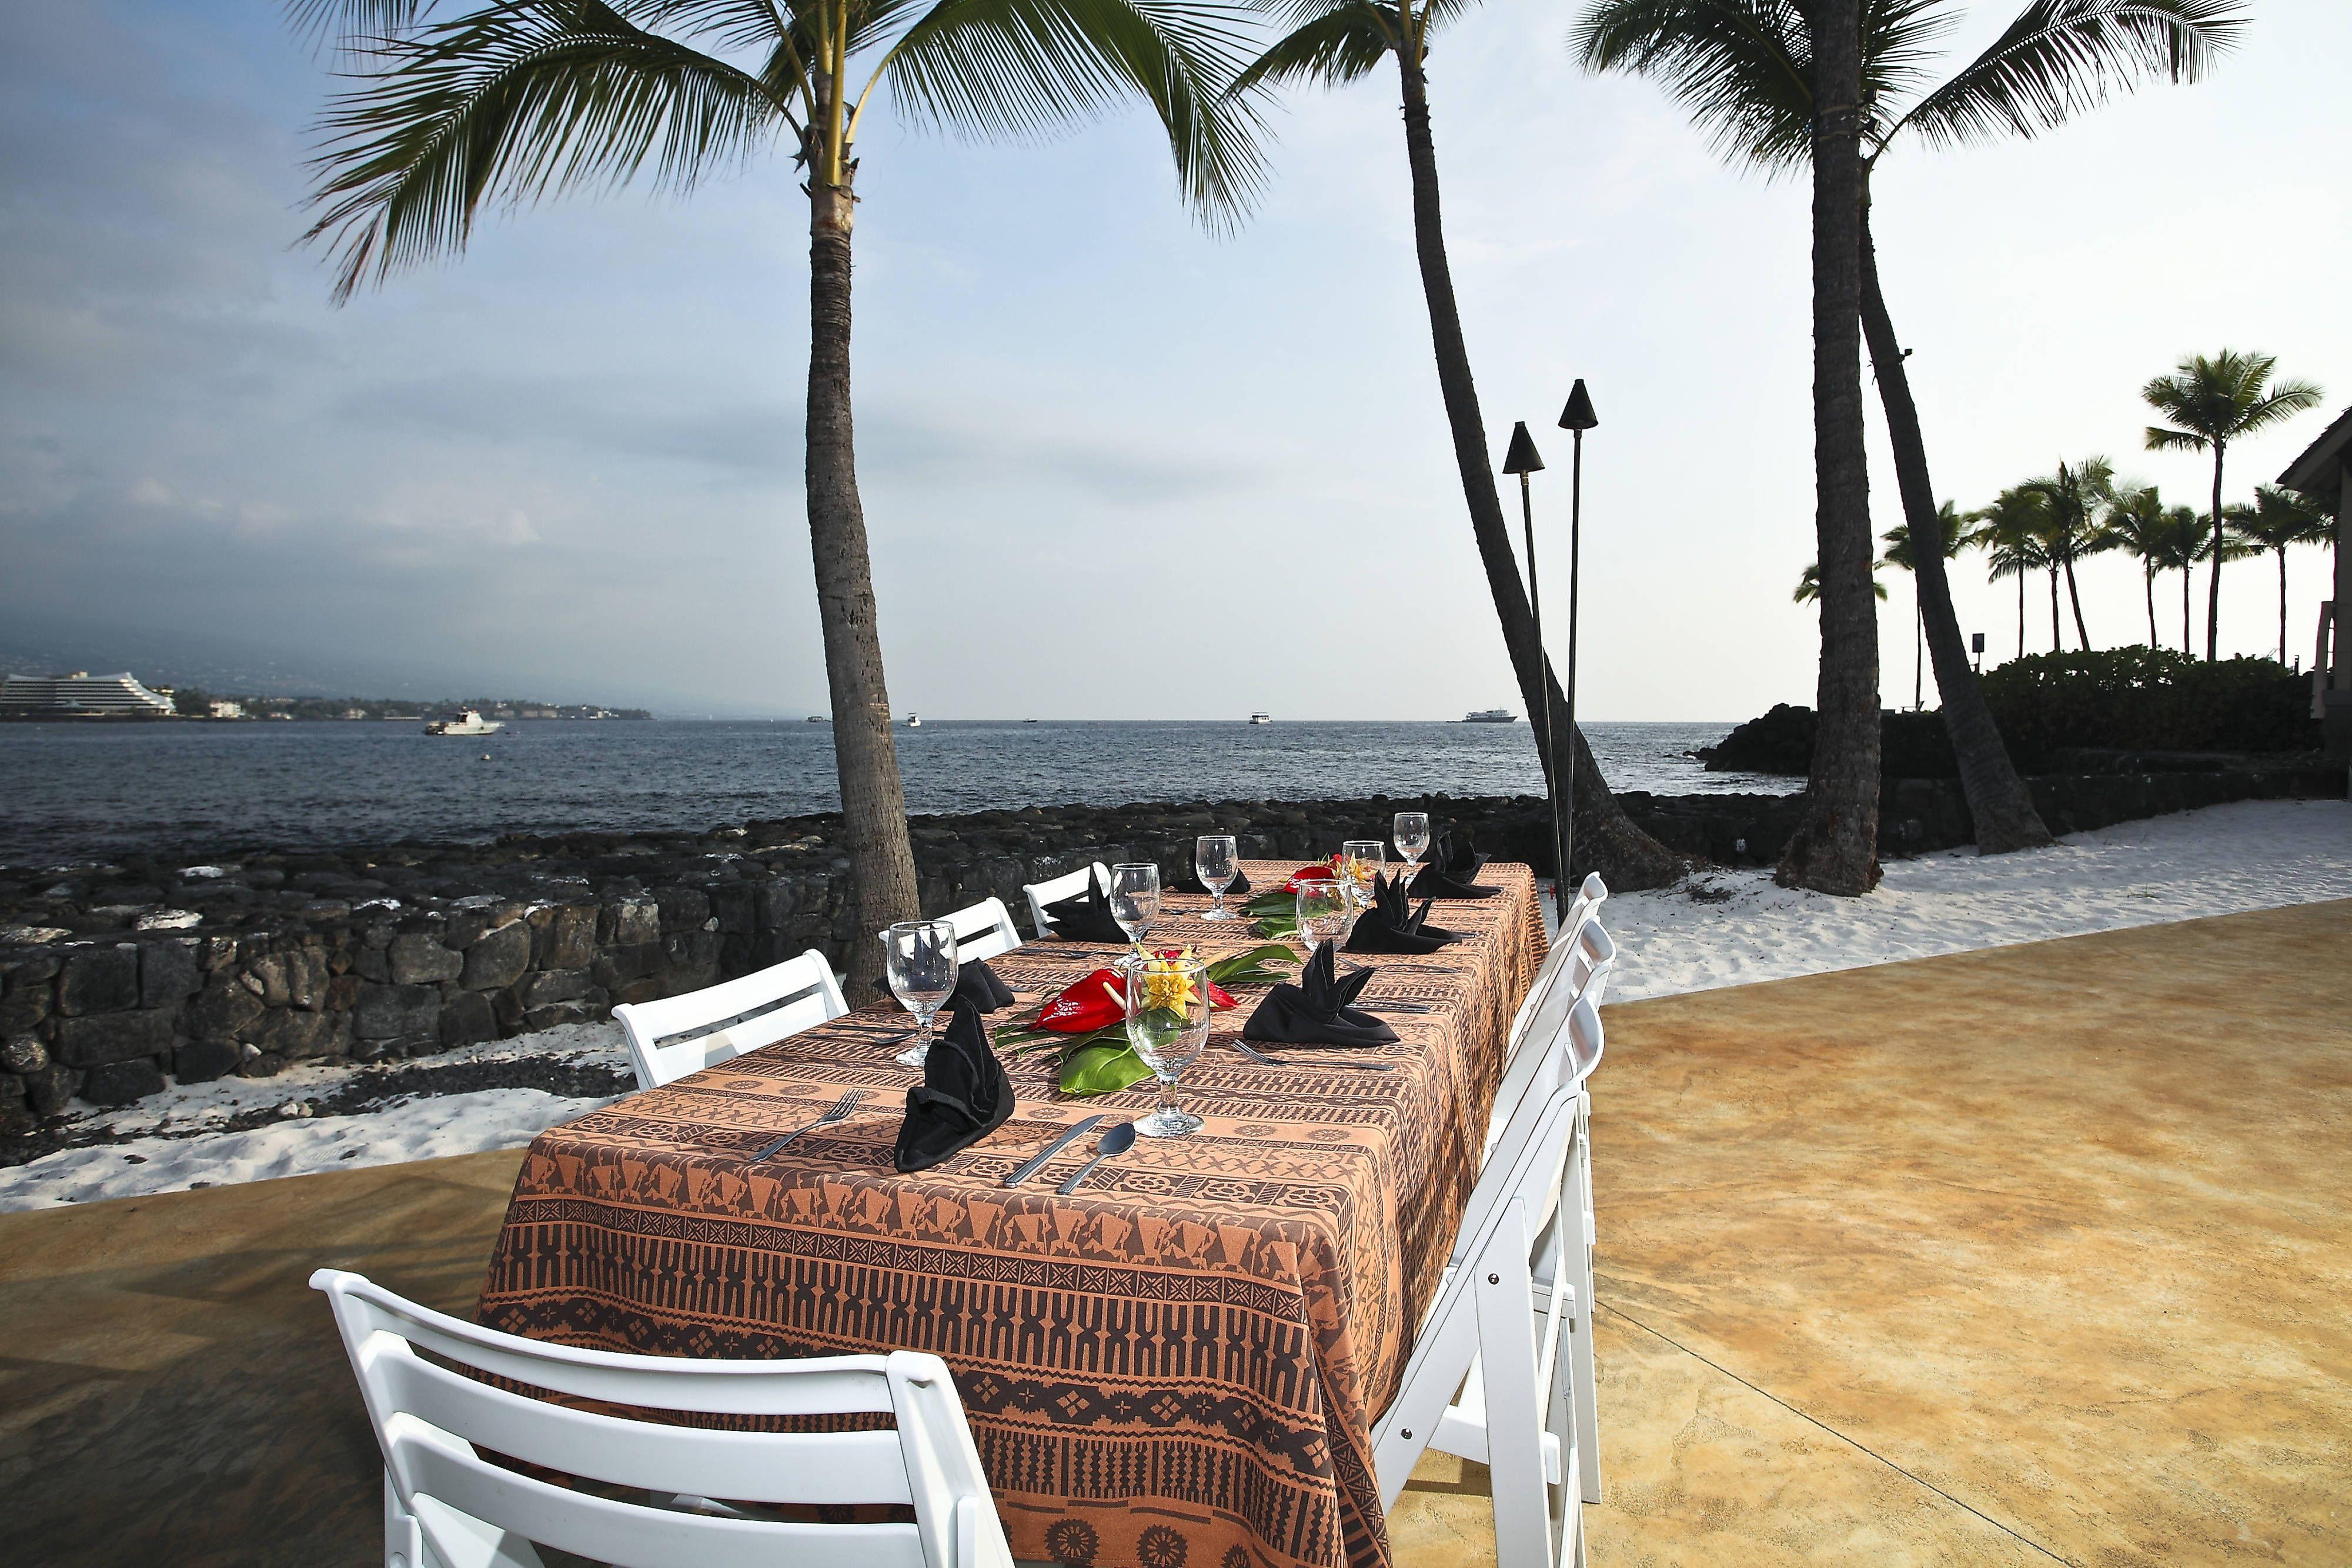 Courtyard King Kamehameha's Kona Beach Hotel Luau Grounds